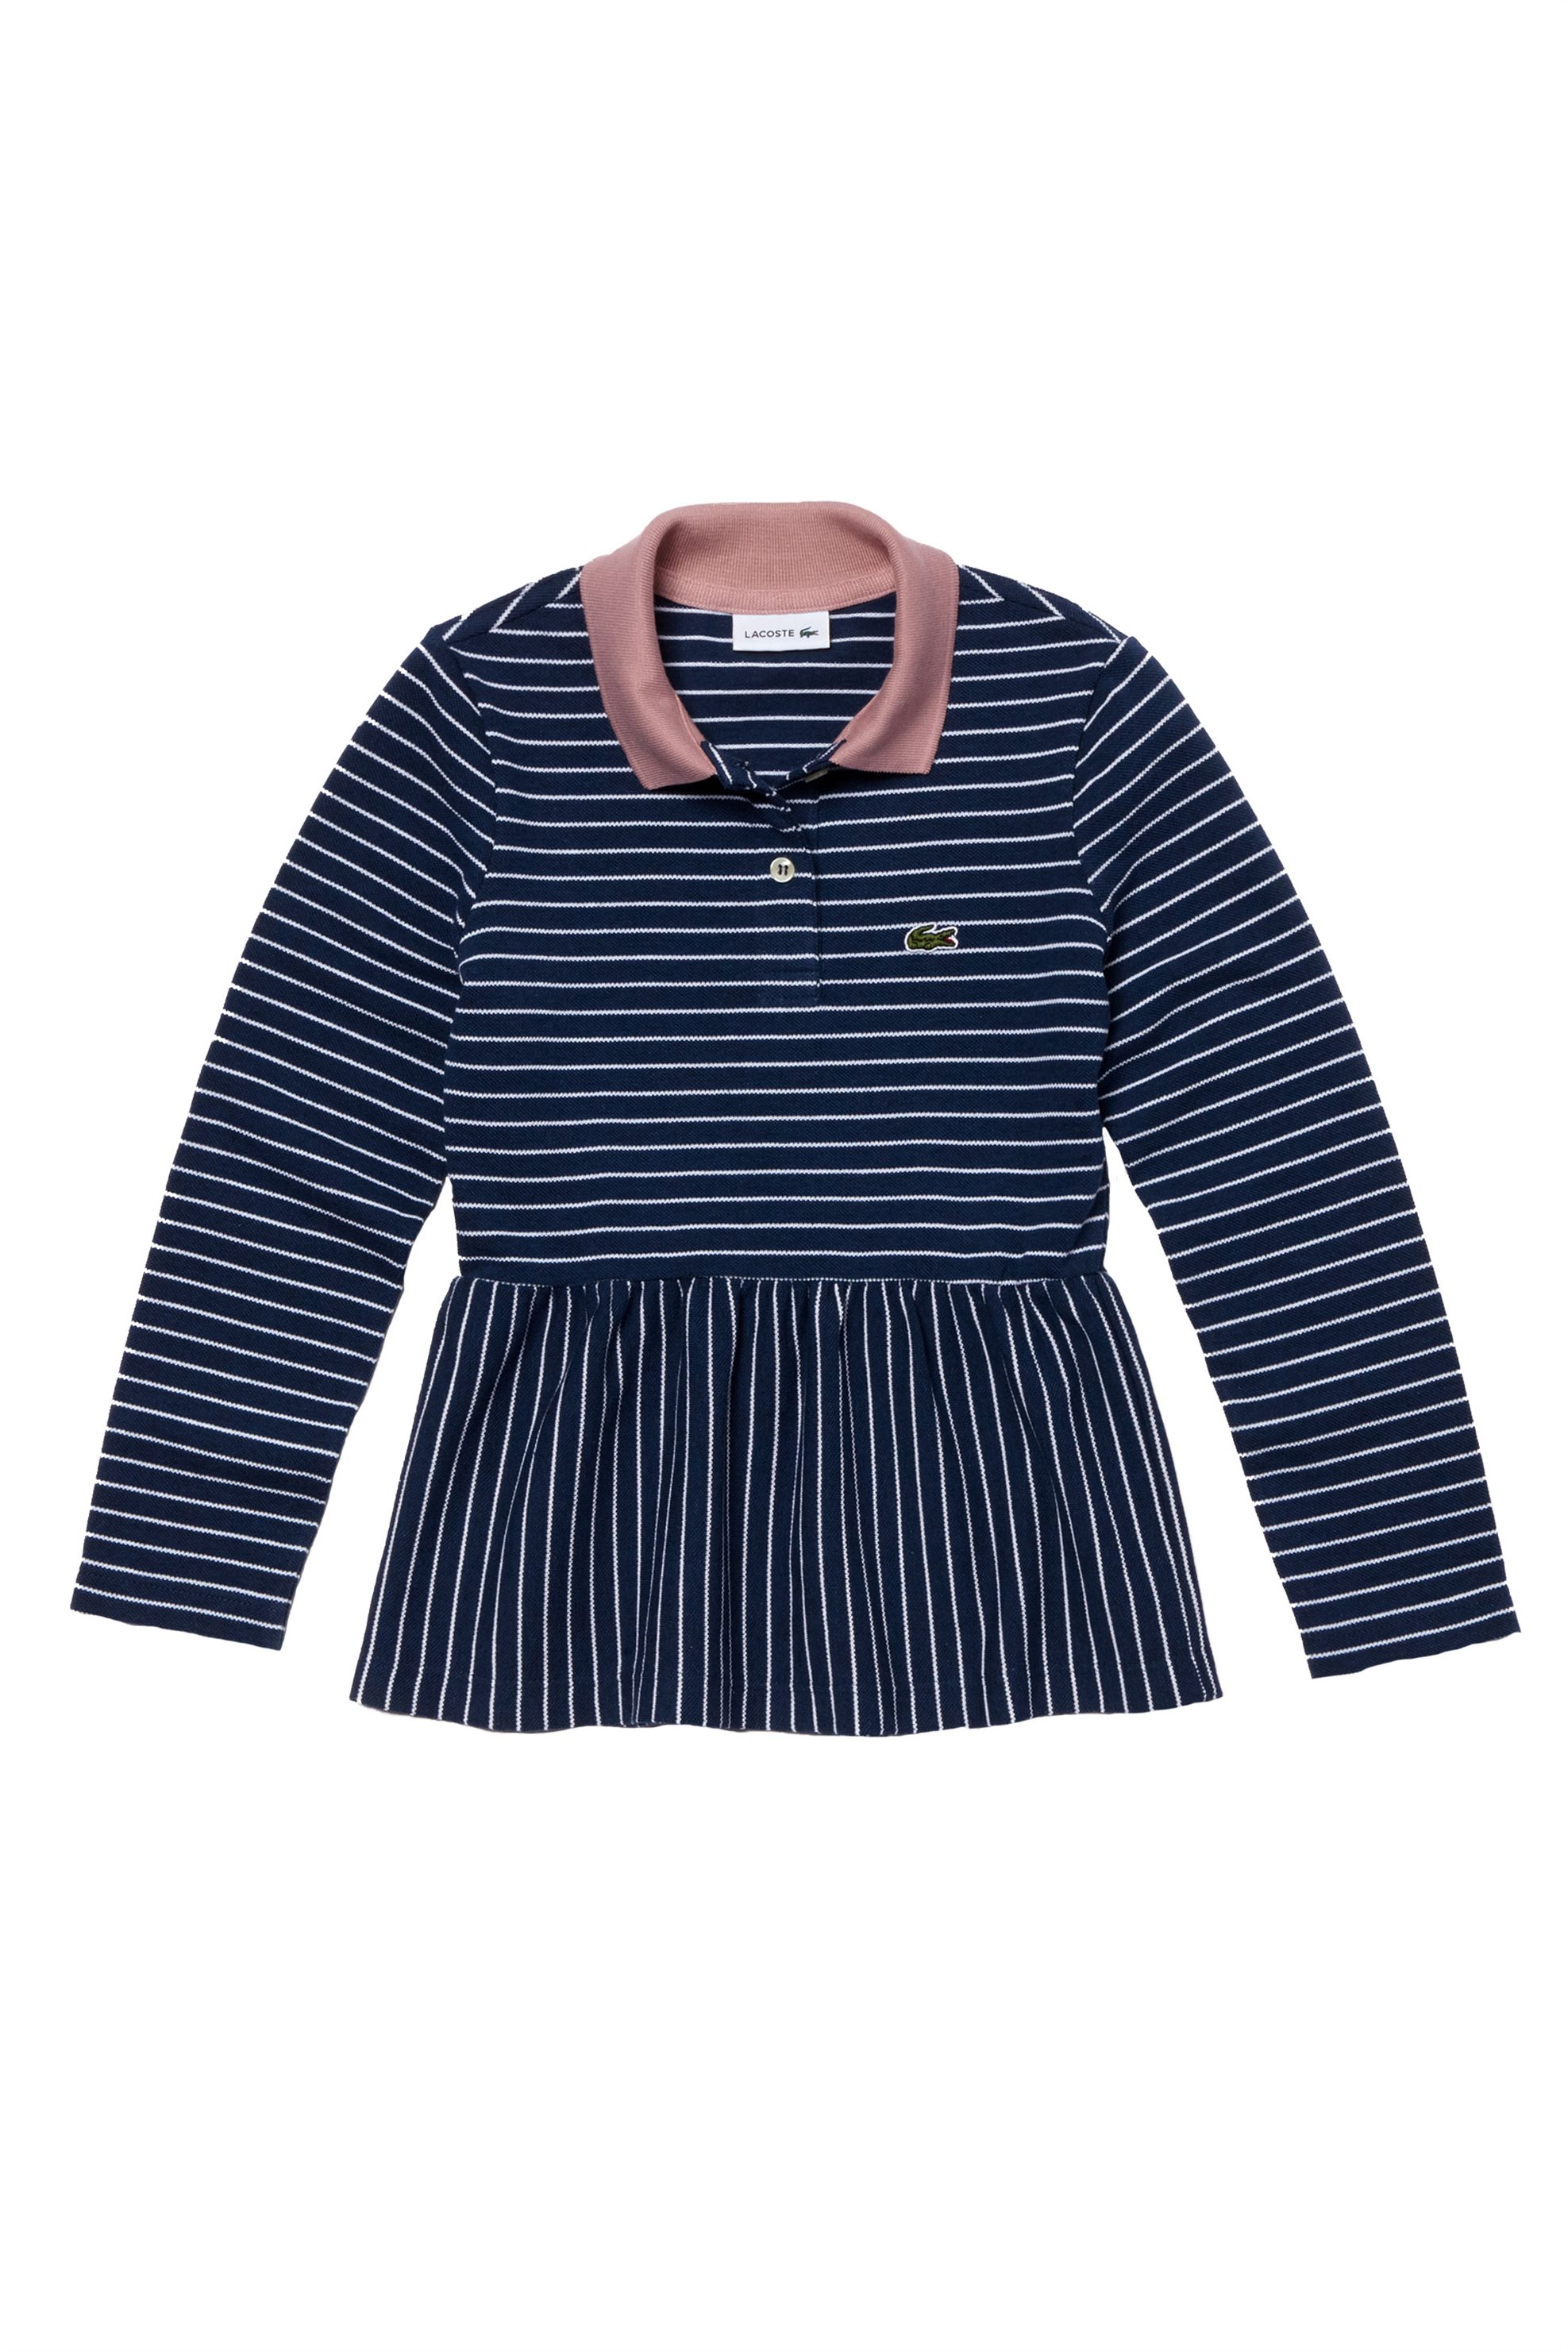 Lacoste παιδική μπλούζα πόλο μακρυμάνικη ριγέ Kids Collection - PJ9811 - Μπλε Σκ παιδι   κοριτσι   4 14 ετων   tops   παντελόνια   μπλούζες   πουκάμισα   πόλο